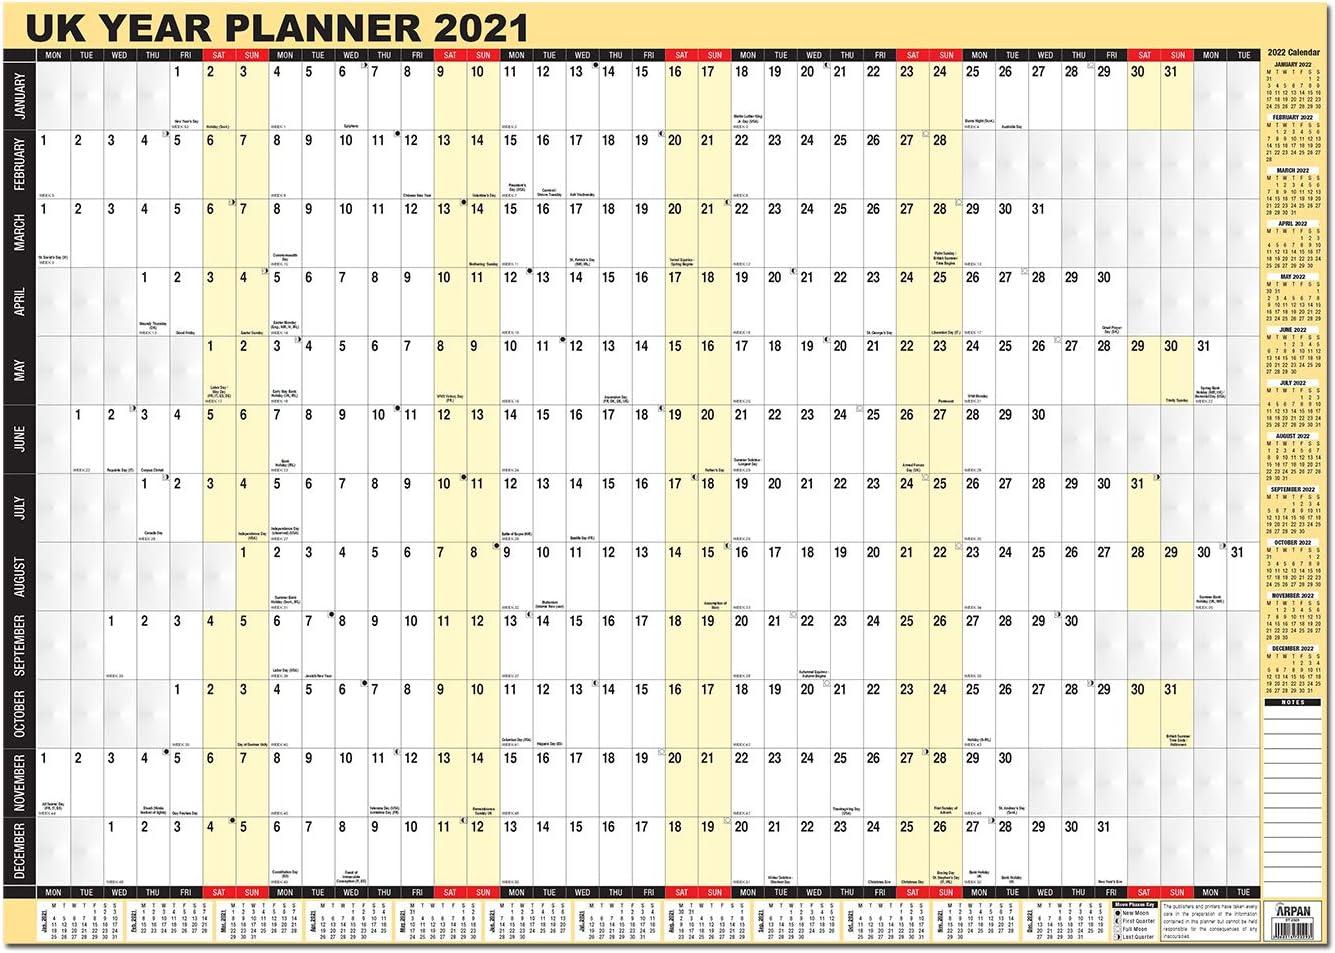 2021 Full Year Laminated Wall Planner Calendar